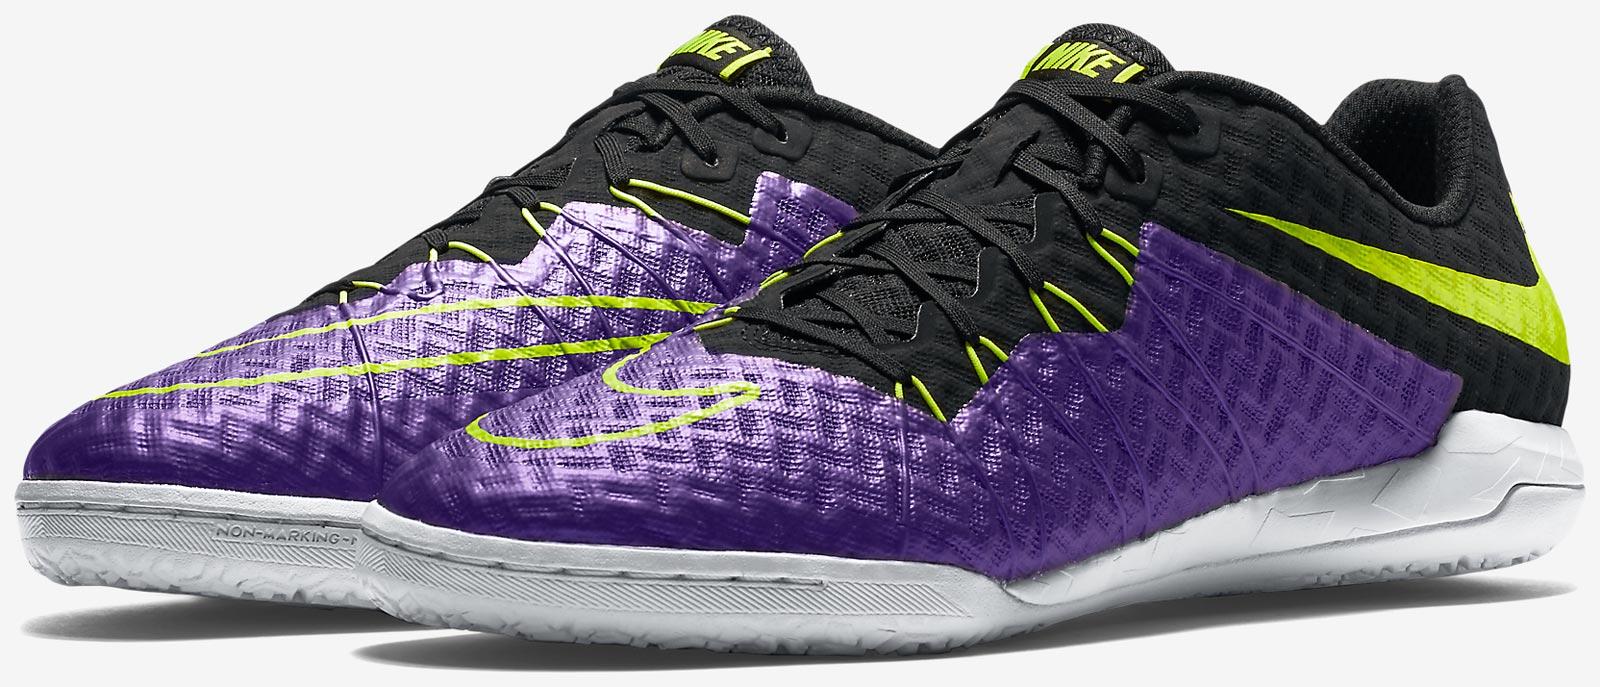 2015 Nike Purple